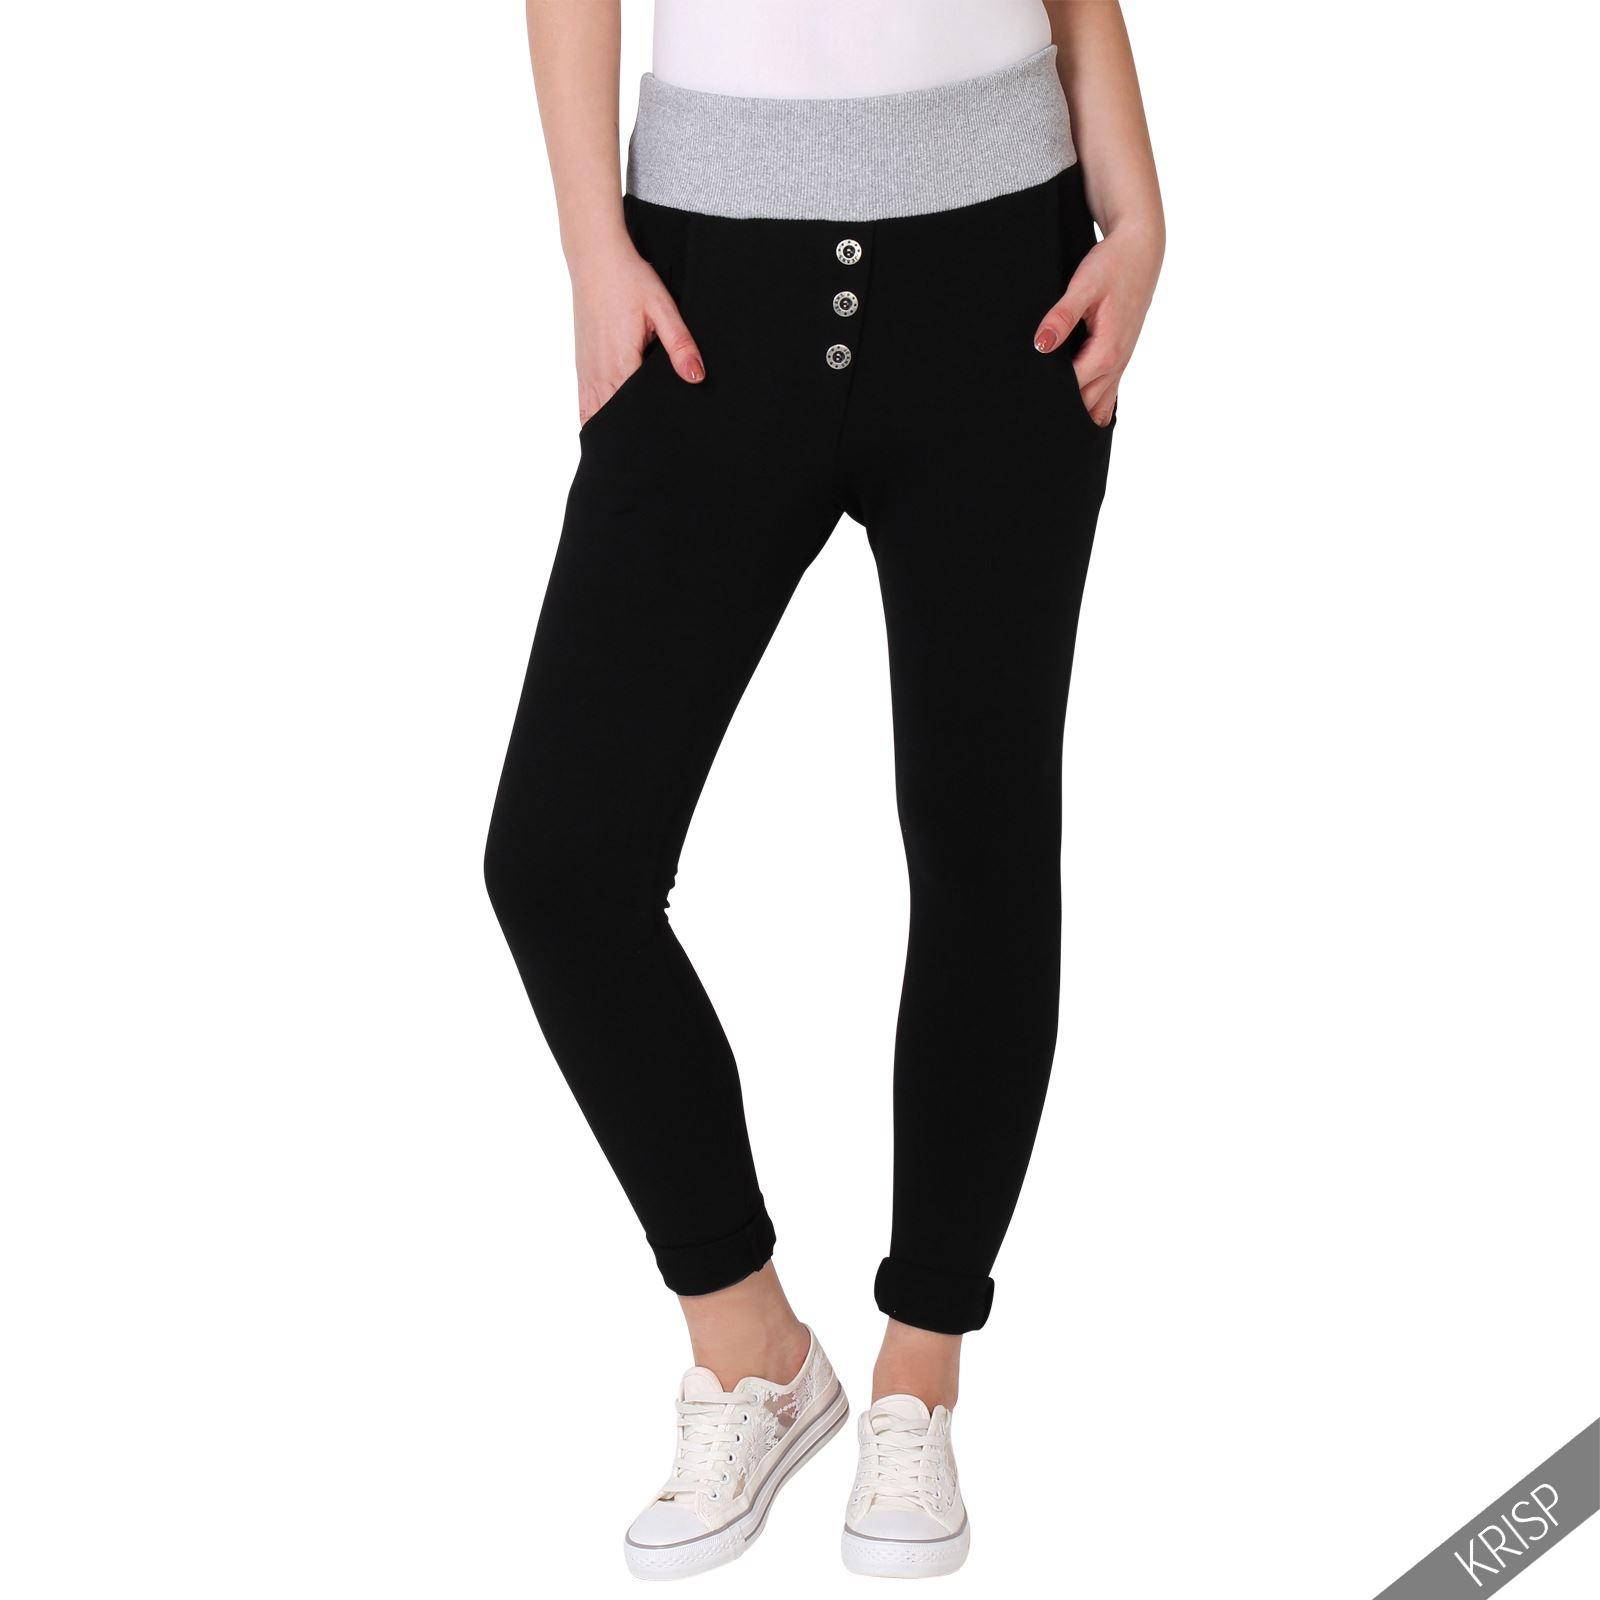 femme pantalon taille haute ample yoga d tente casual ebay. Black Bedroom Furniture Sets. Home Design Ideas